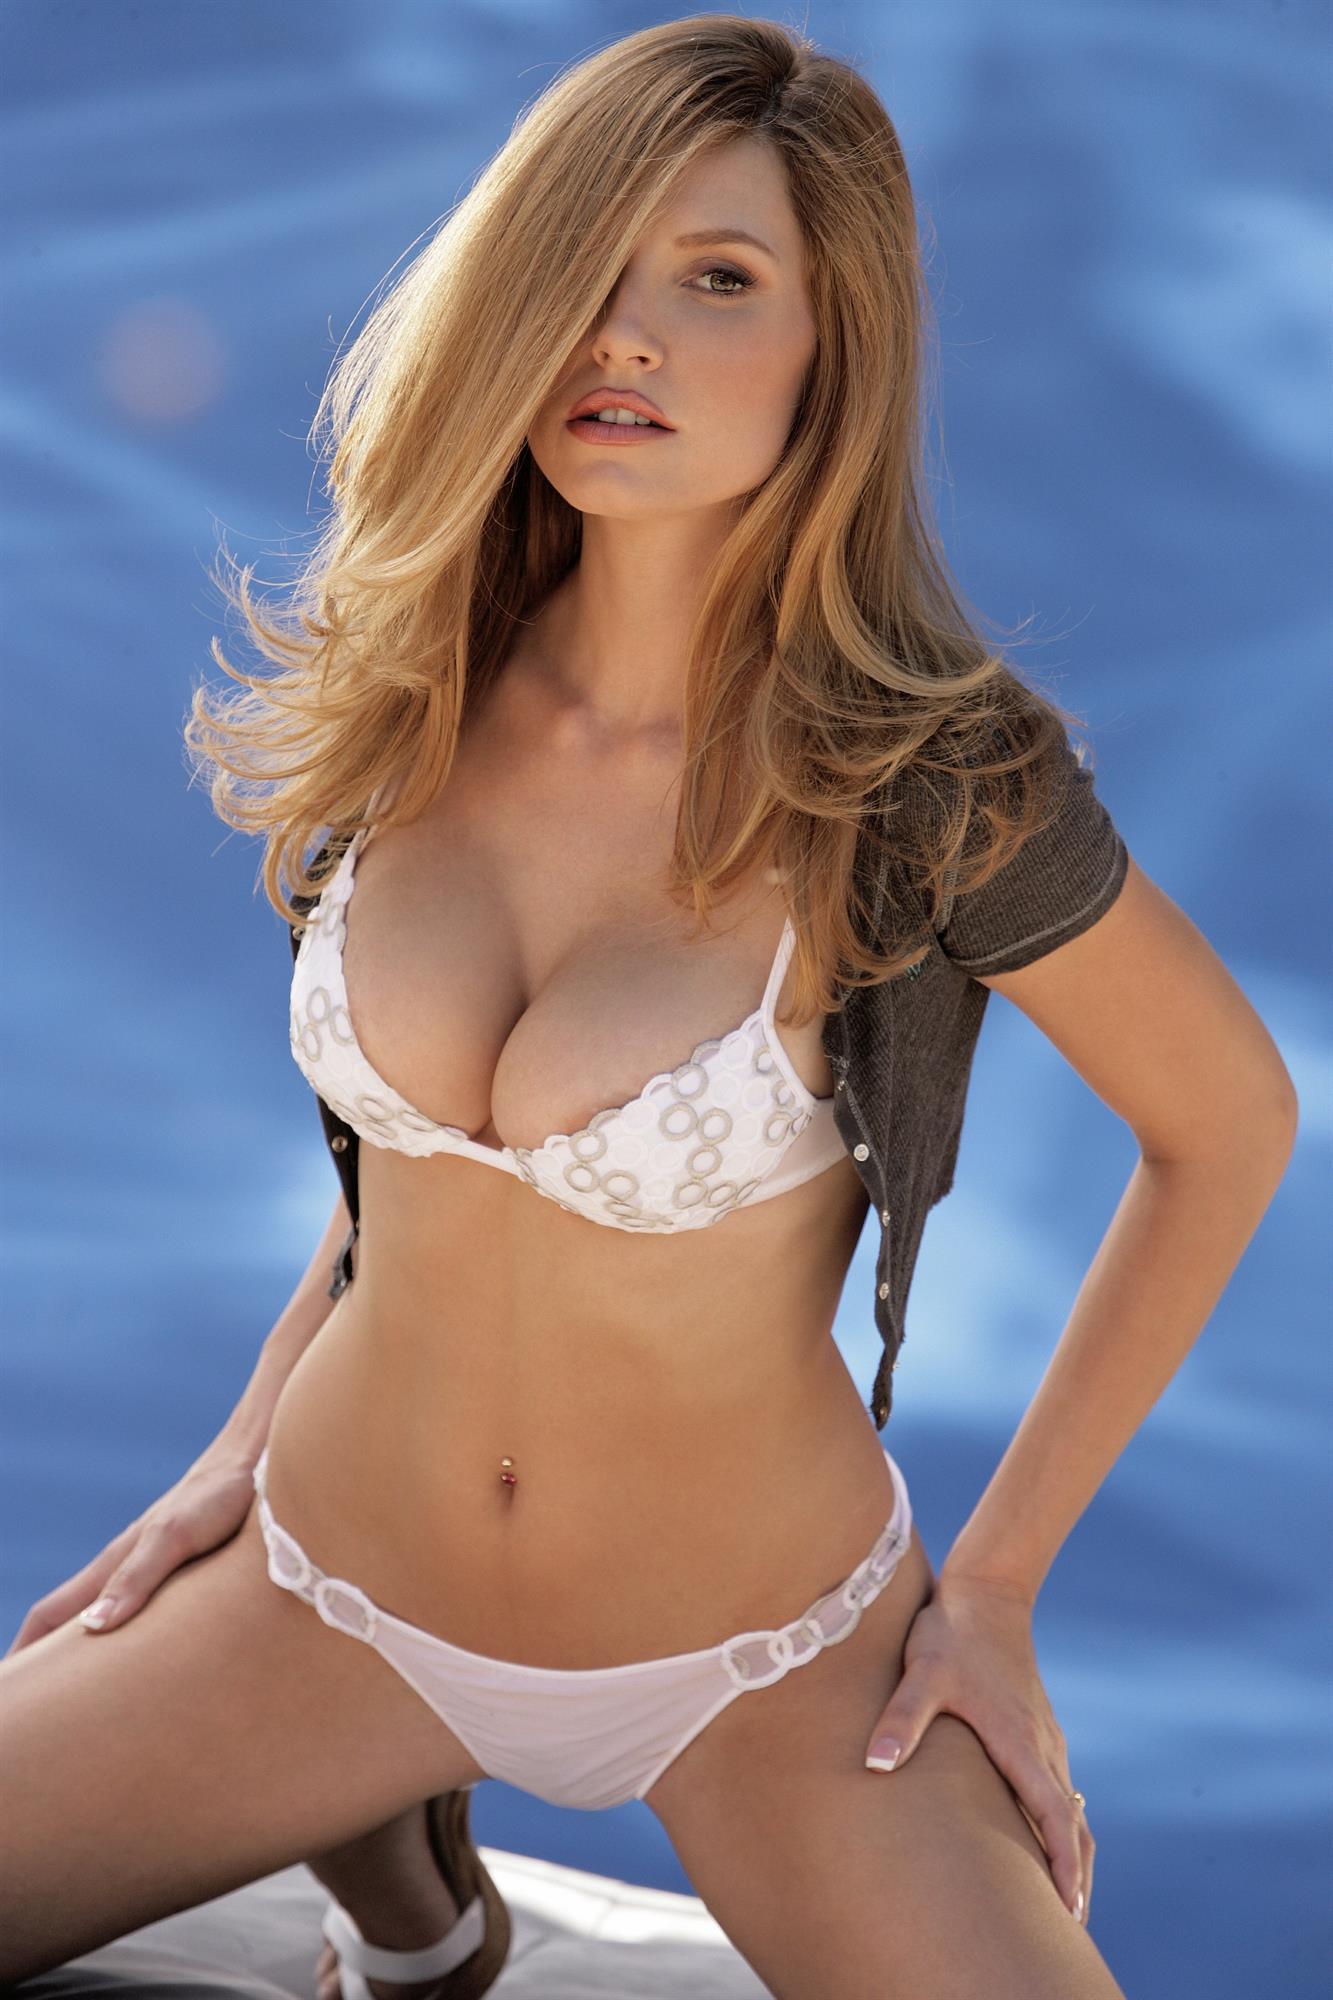 Jamie Lynn in lingerie